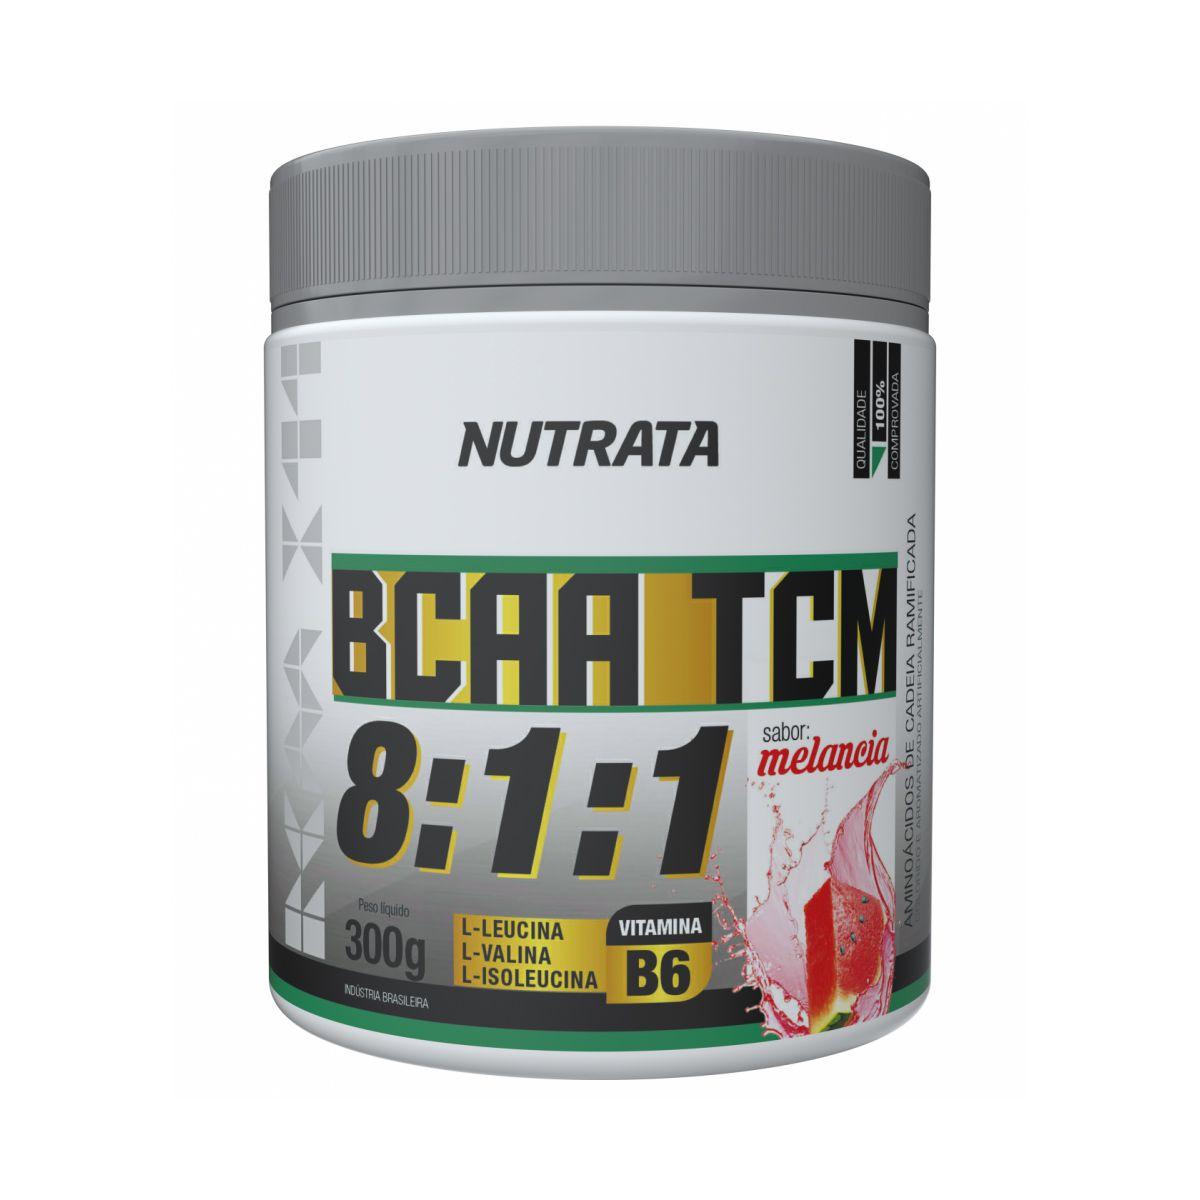 BCAA 8:1:1 TCM - 300g - Nutrata